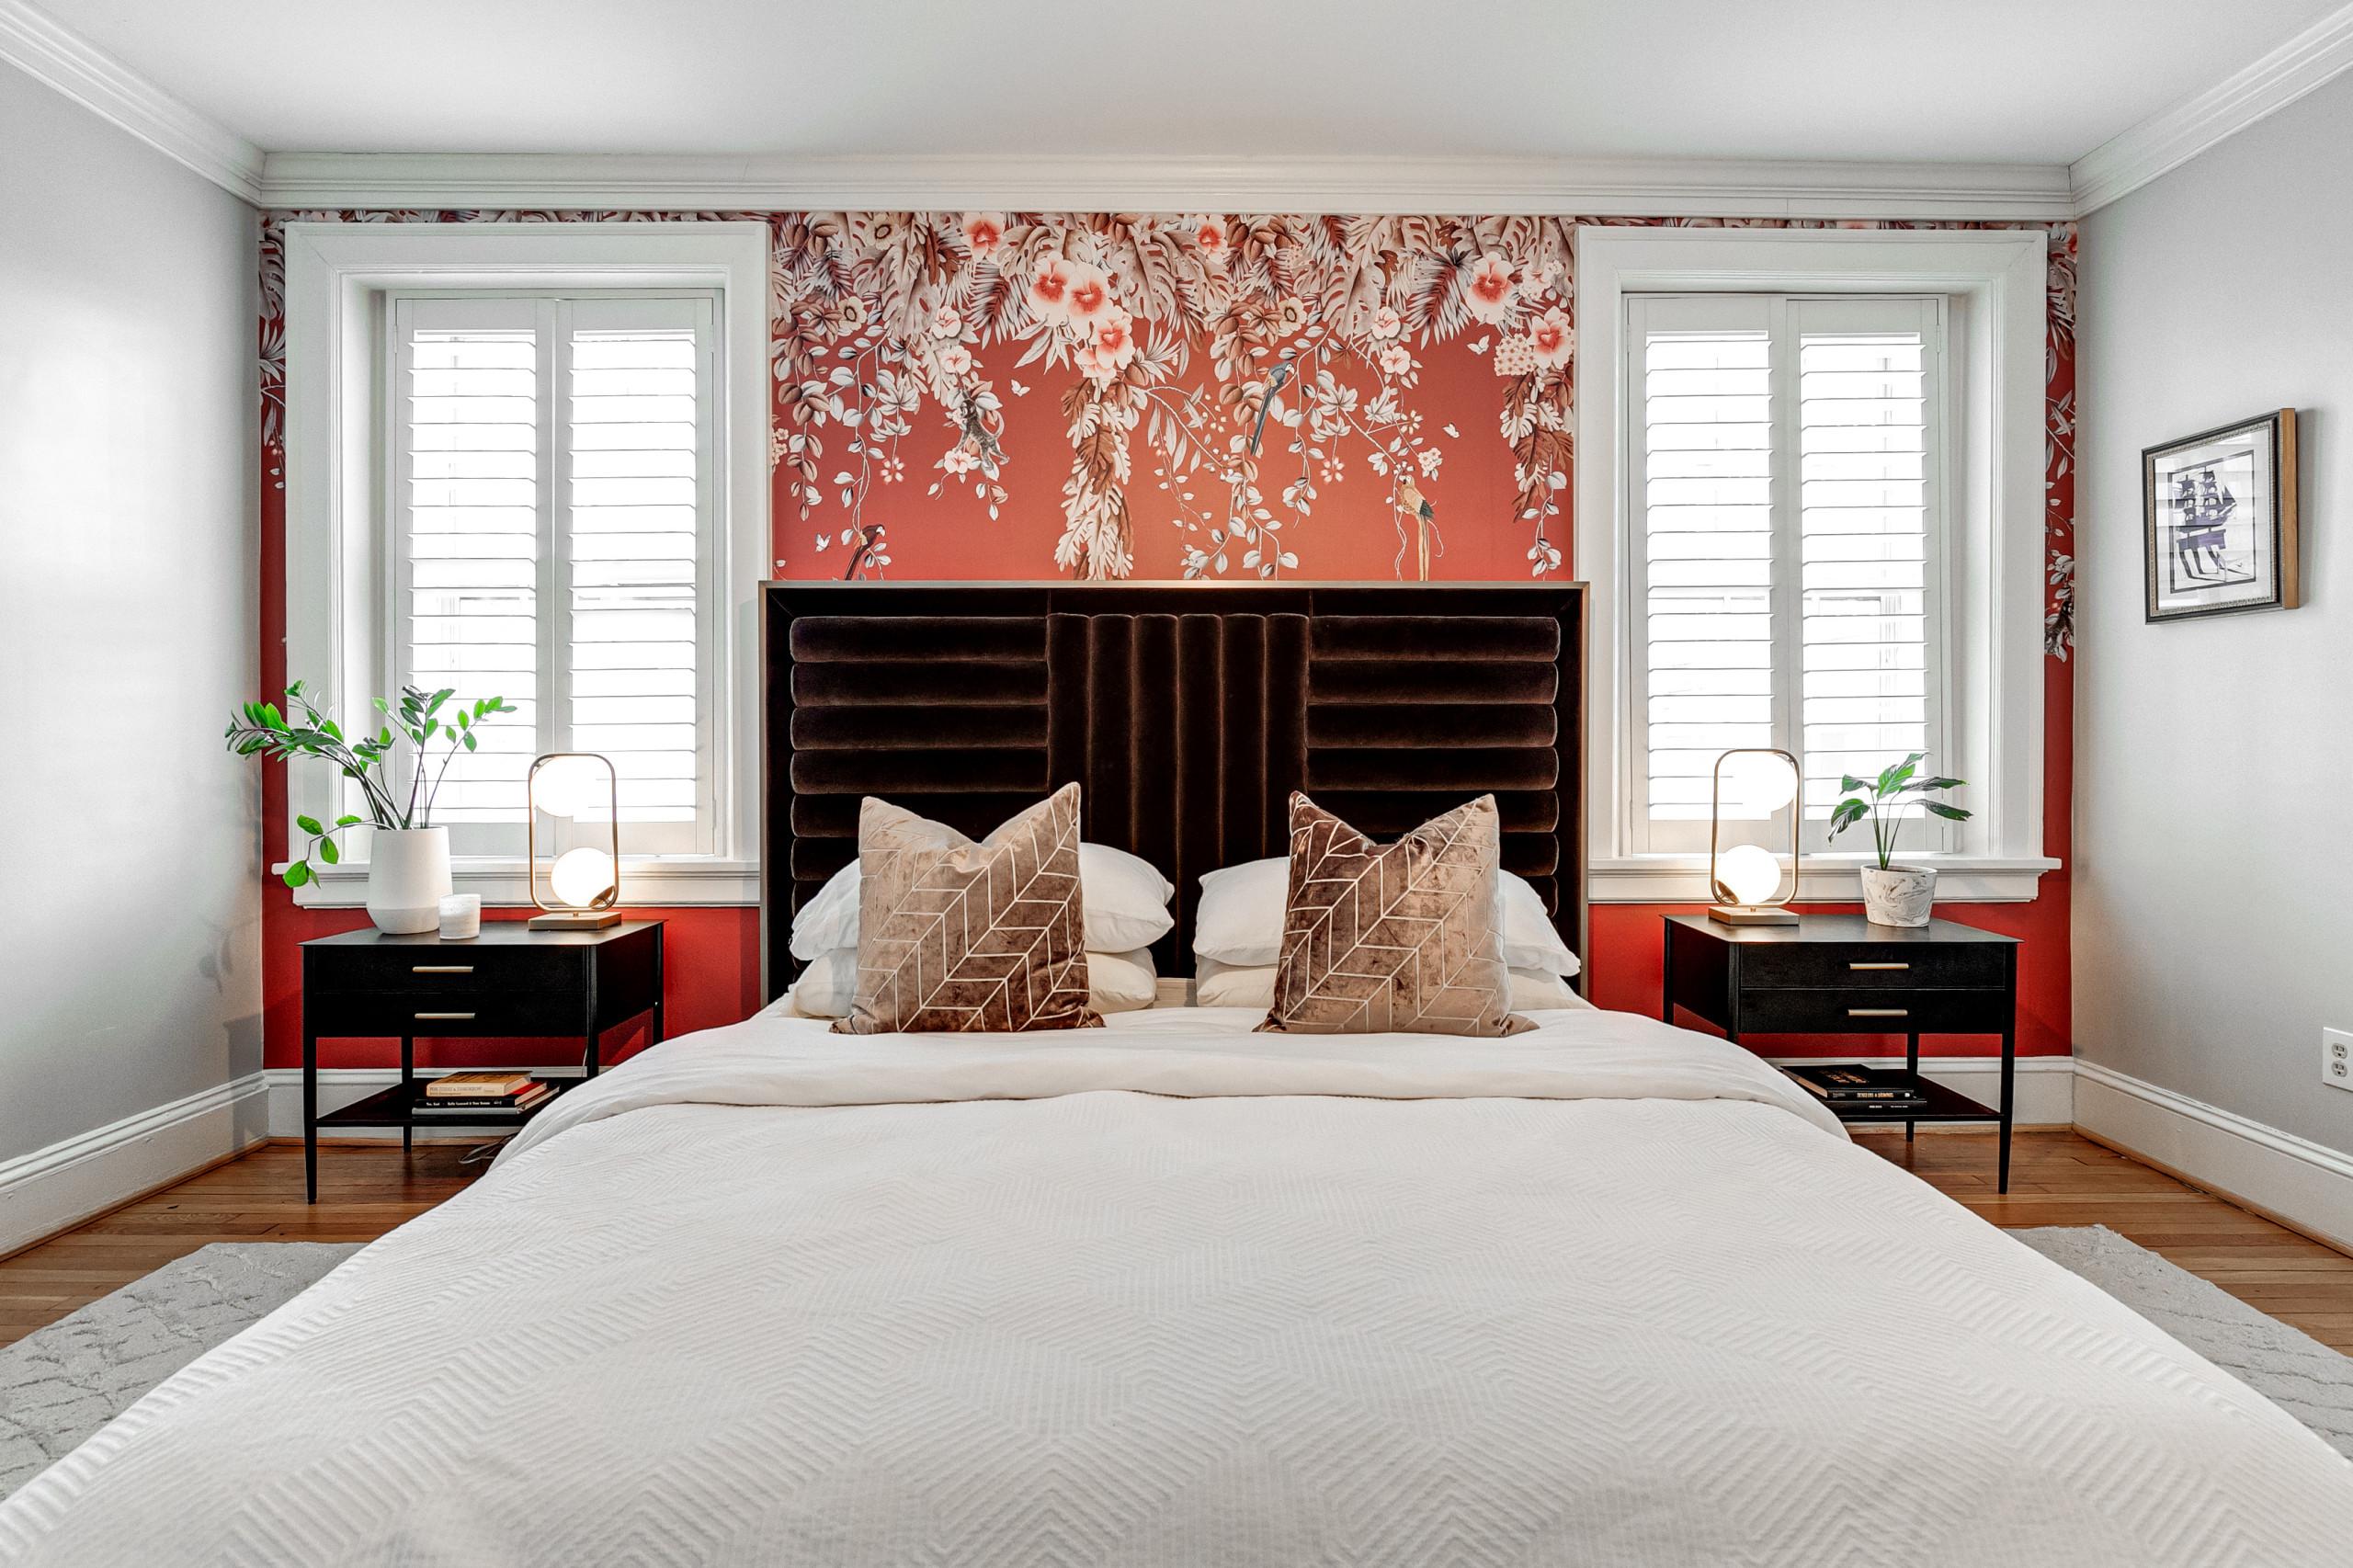 75 Beautiful Bedroom Pictures Ideas September 2020 Houzz